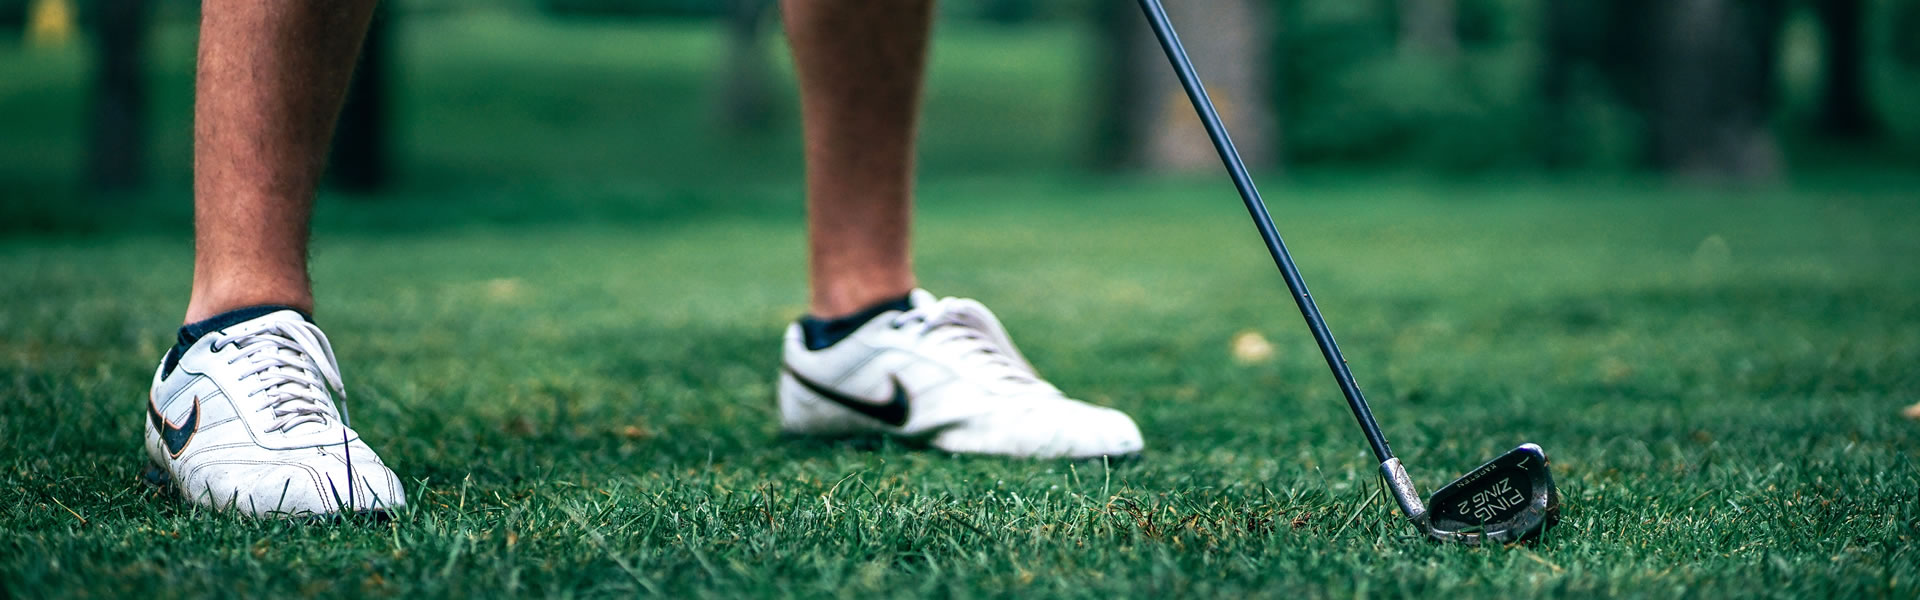 Deporte Golf